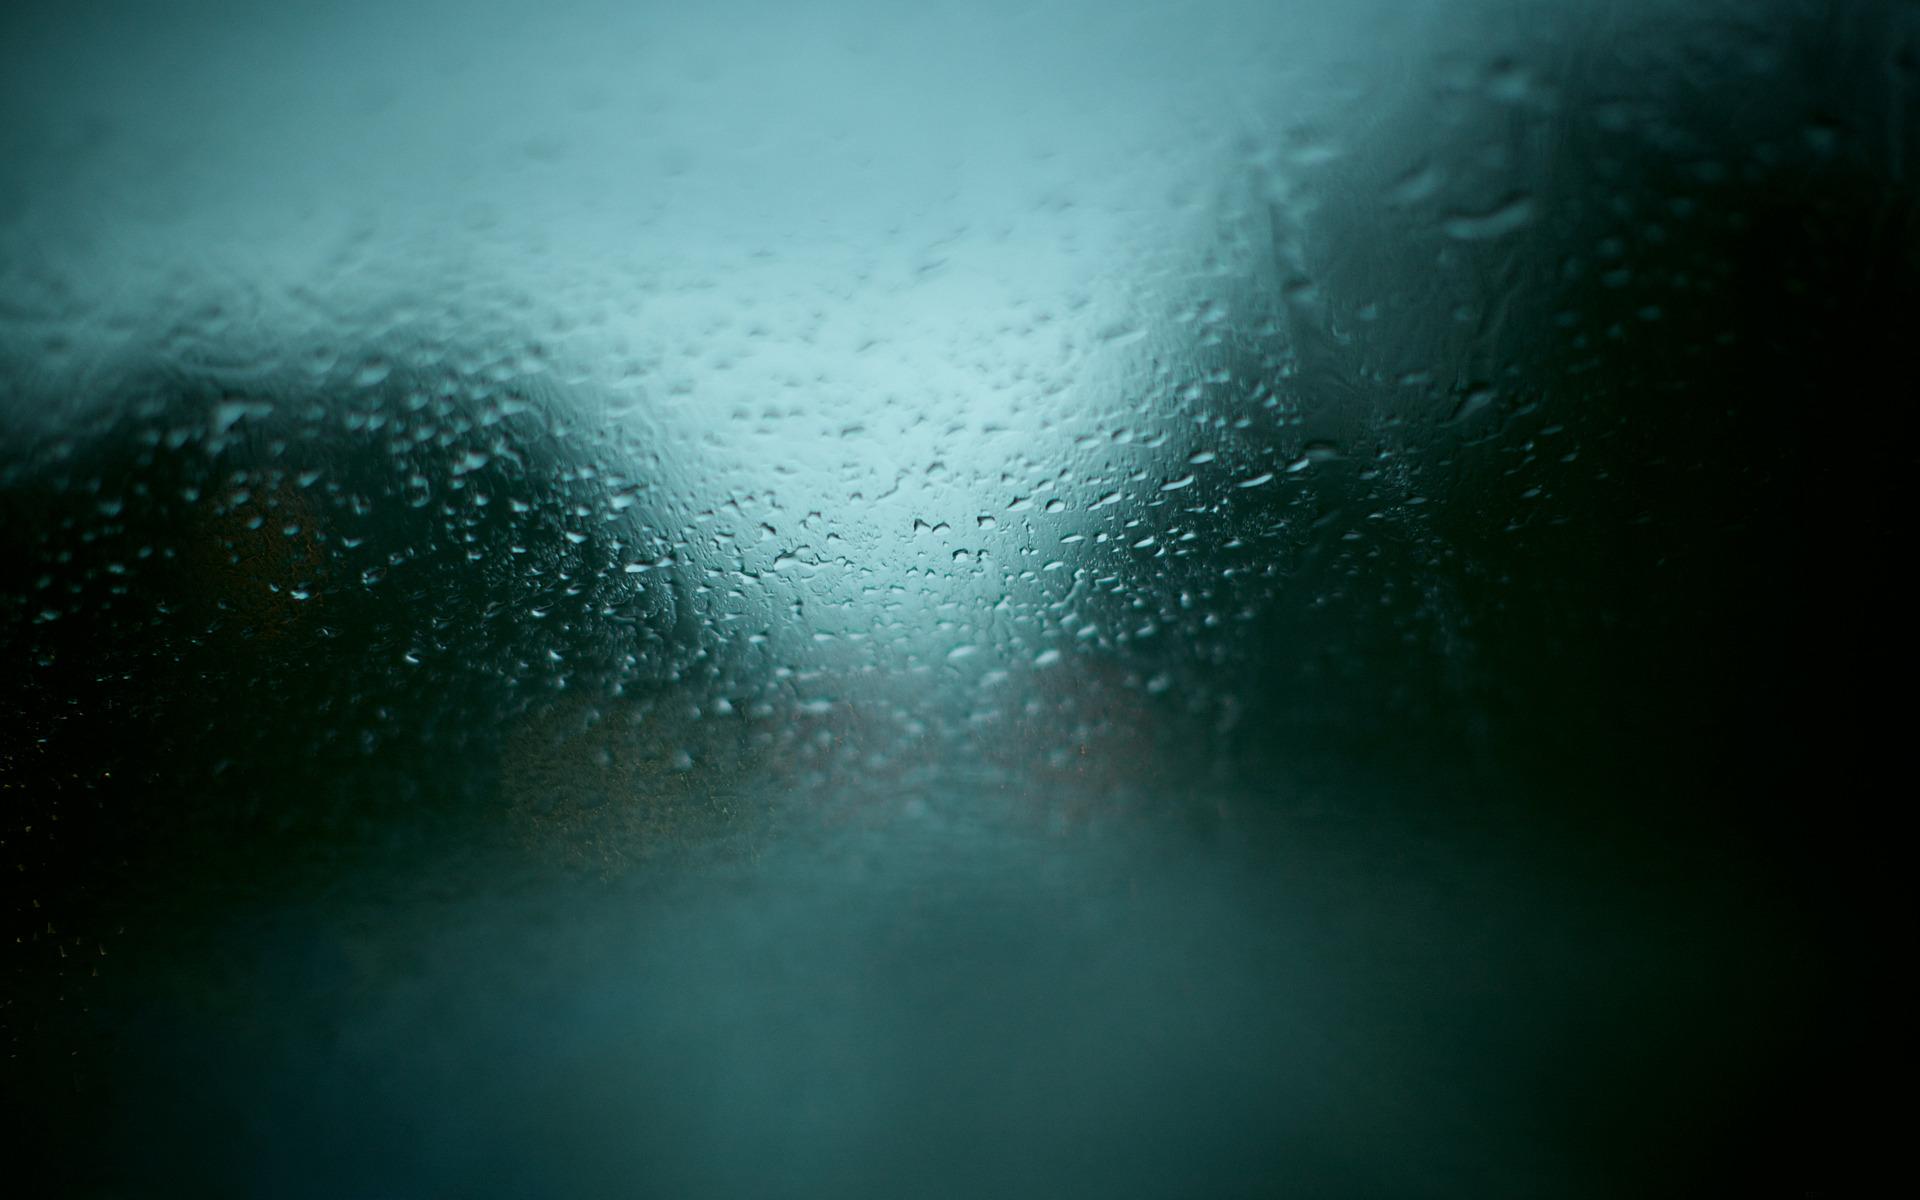 Glass window texture -  Wallpaper Save It